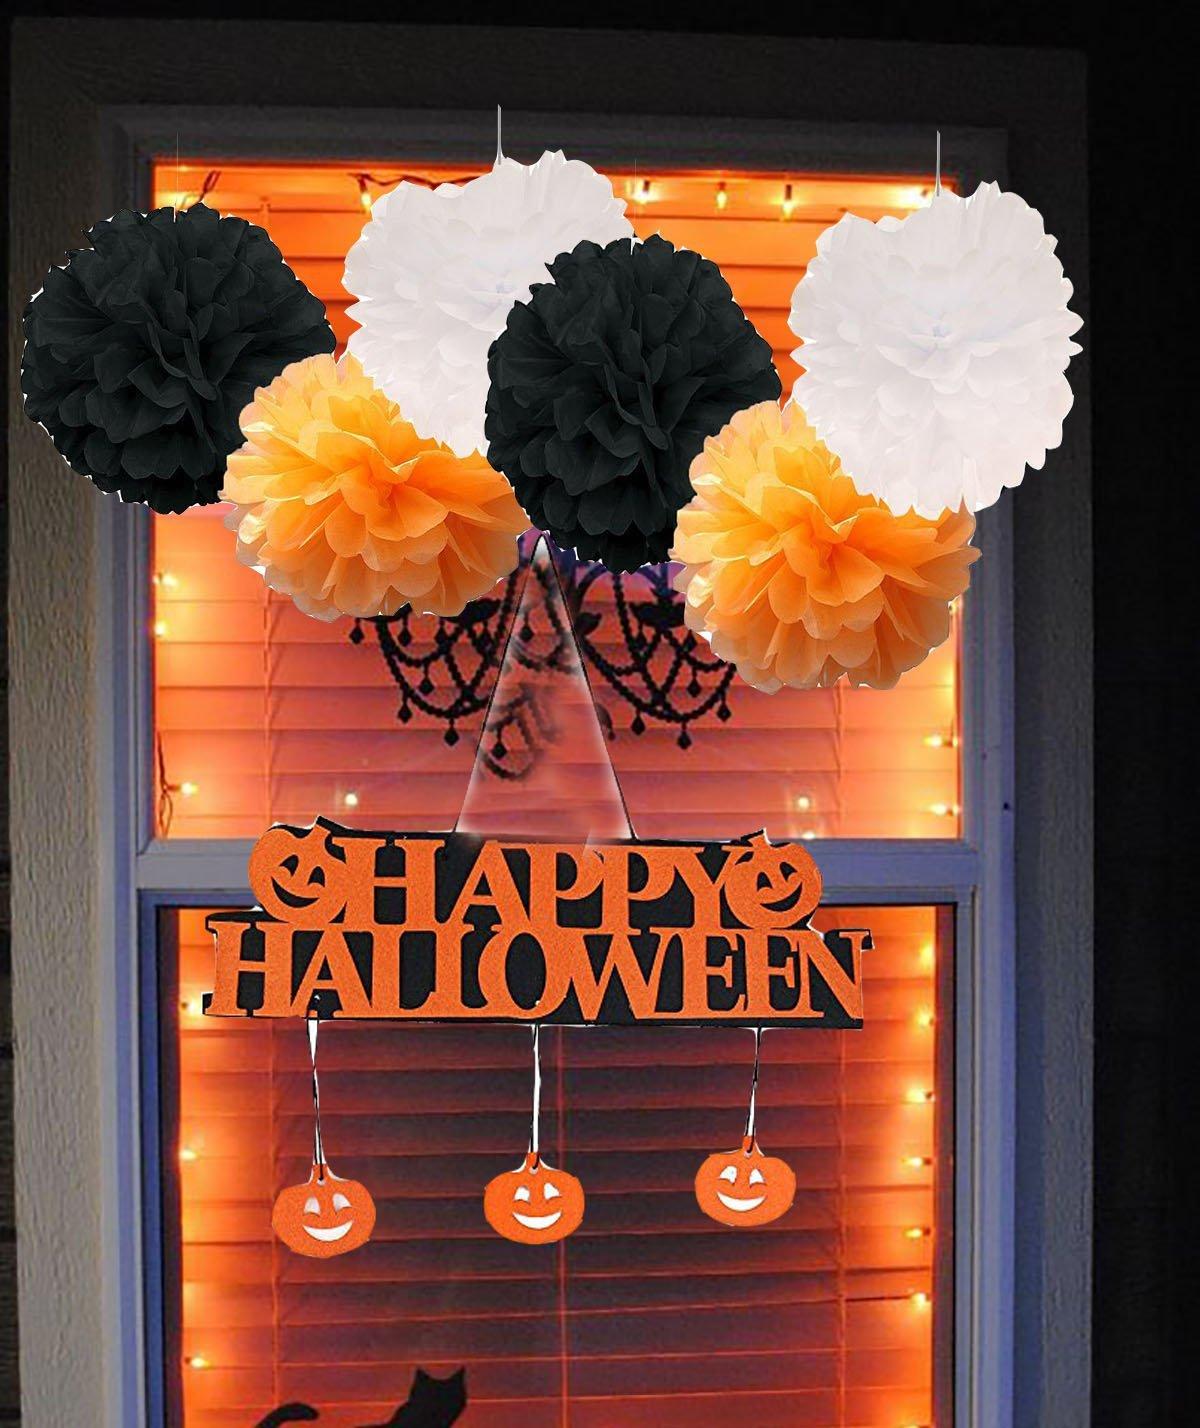 Furuix 10pcs HAPPY HALLOWEEN Window Decoration Pumpkin Pendant Door Decor Hanging Halloween Party Decoration - Halloween Banner White Black Orange Tissue Pom Pom Paper Flower